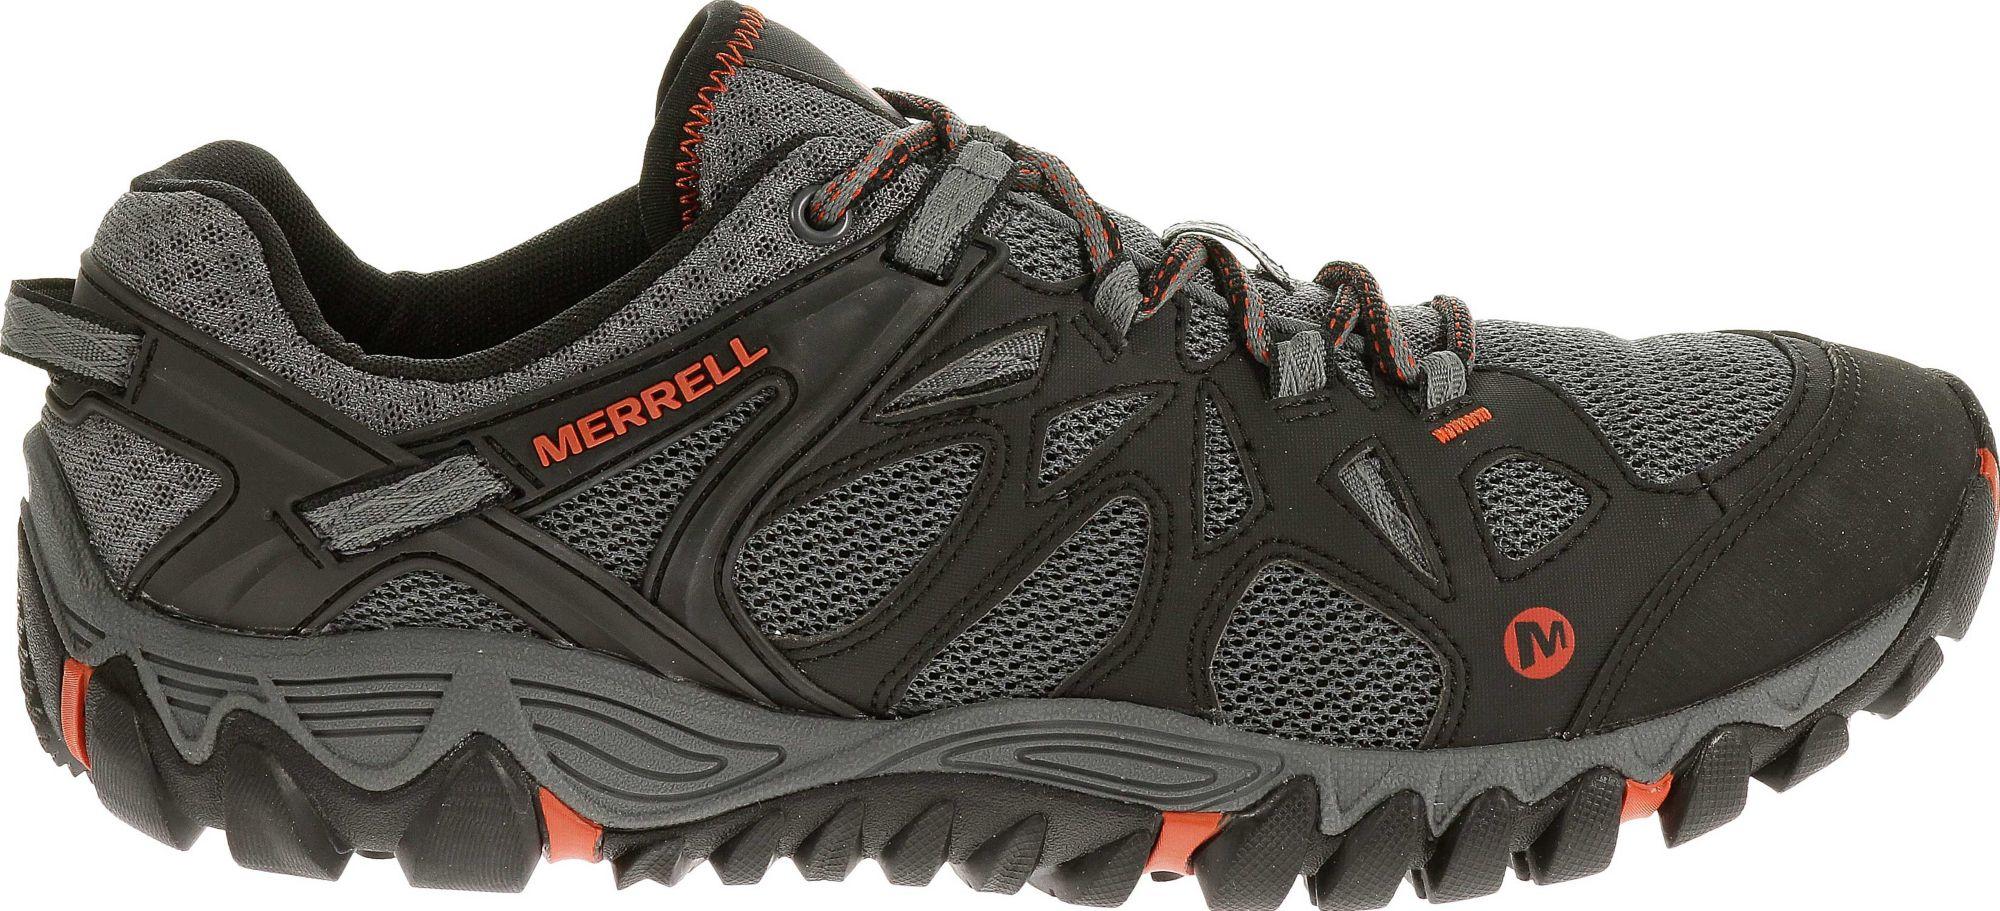 Merrell Men's All Out Blaze Aero Sport Hiking Shoes. 0:00. 0:00 / 0:00.  noImageFound ???